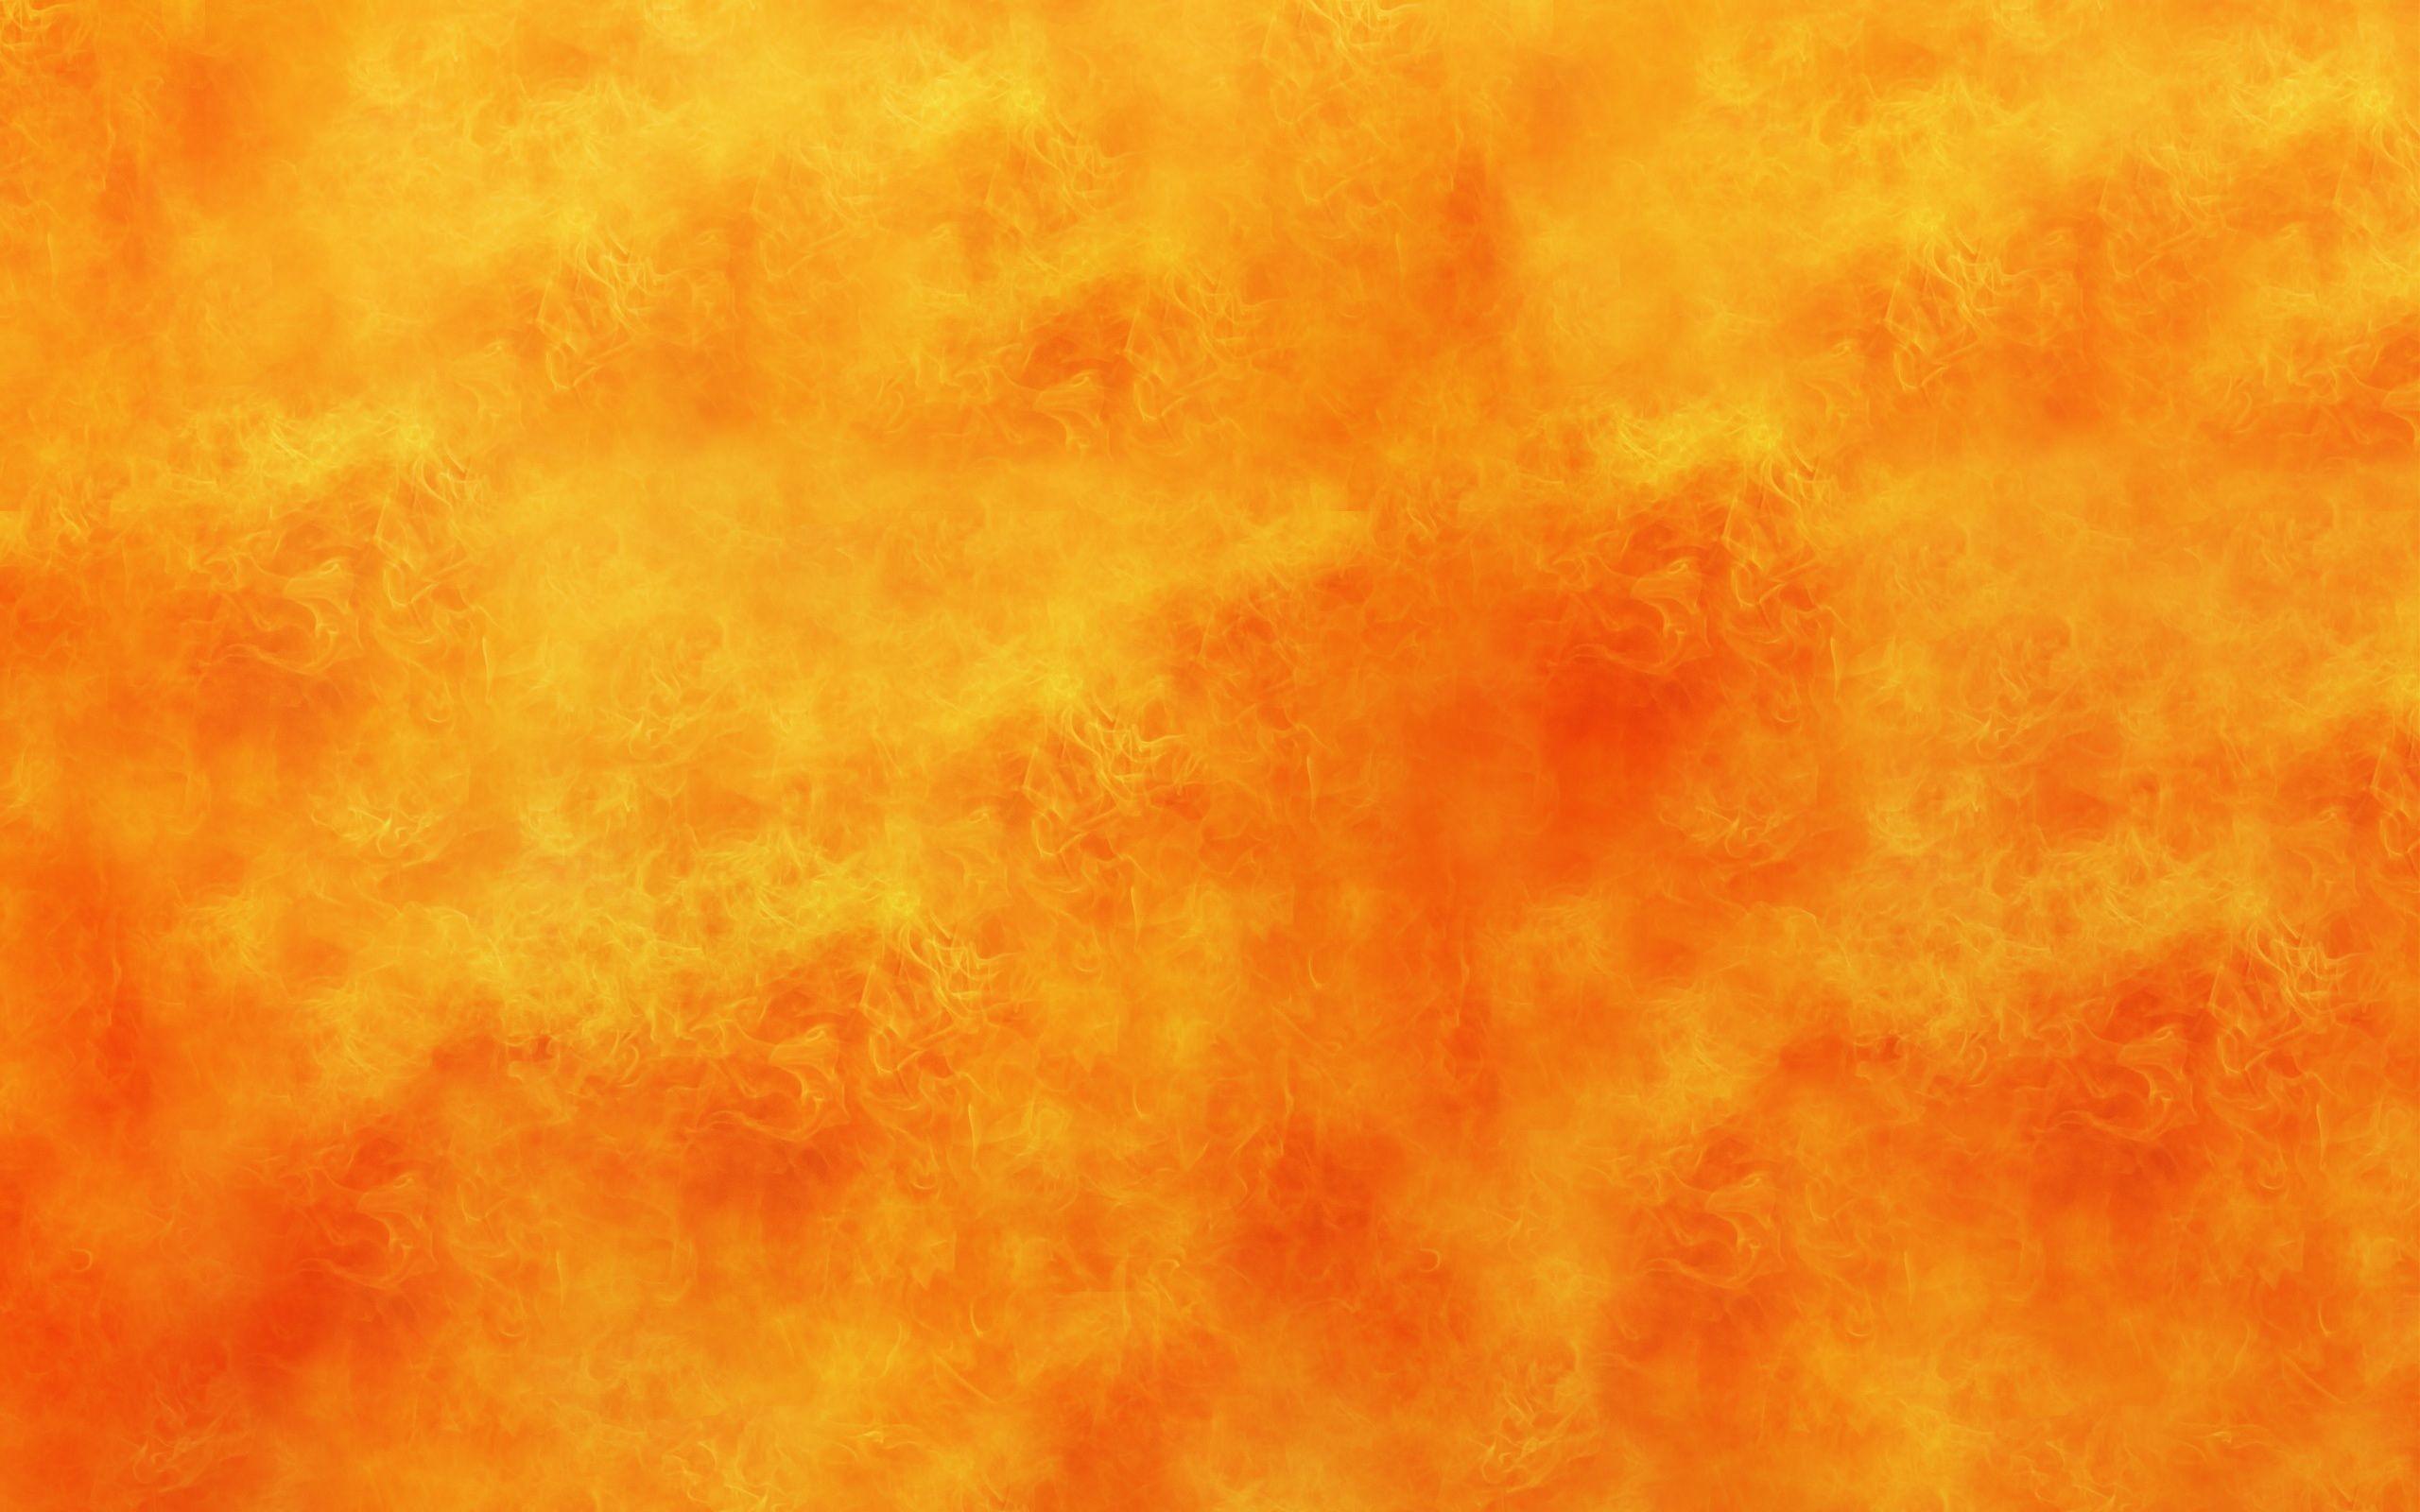 wallpaper-hd-abstract-orange-21.jpg